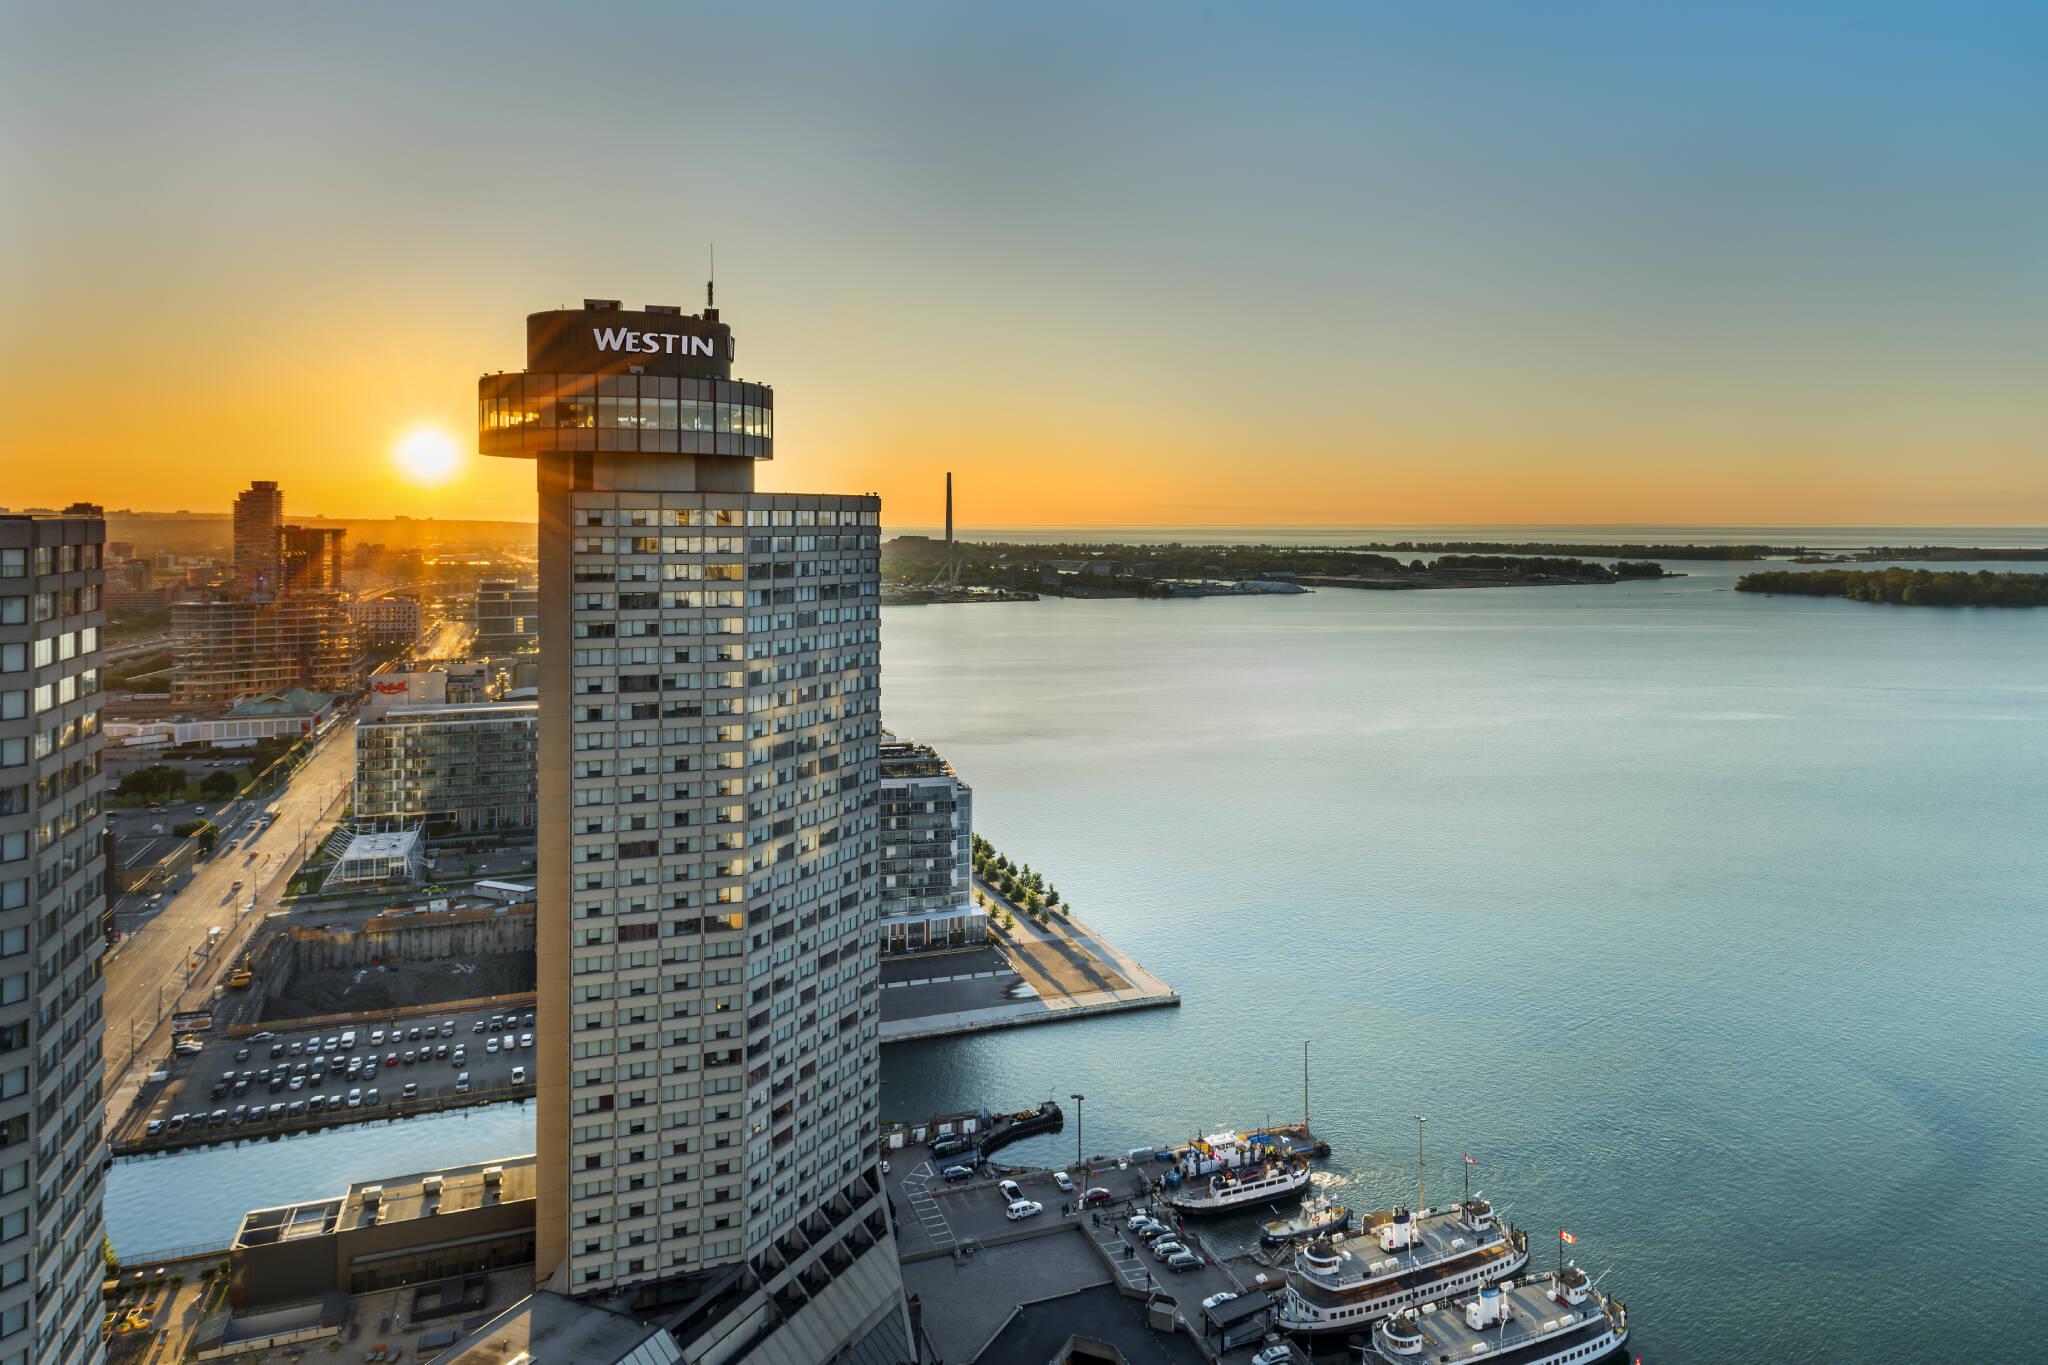 Westin Hotel Toronto